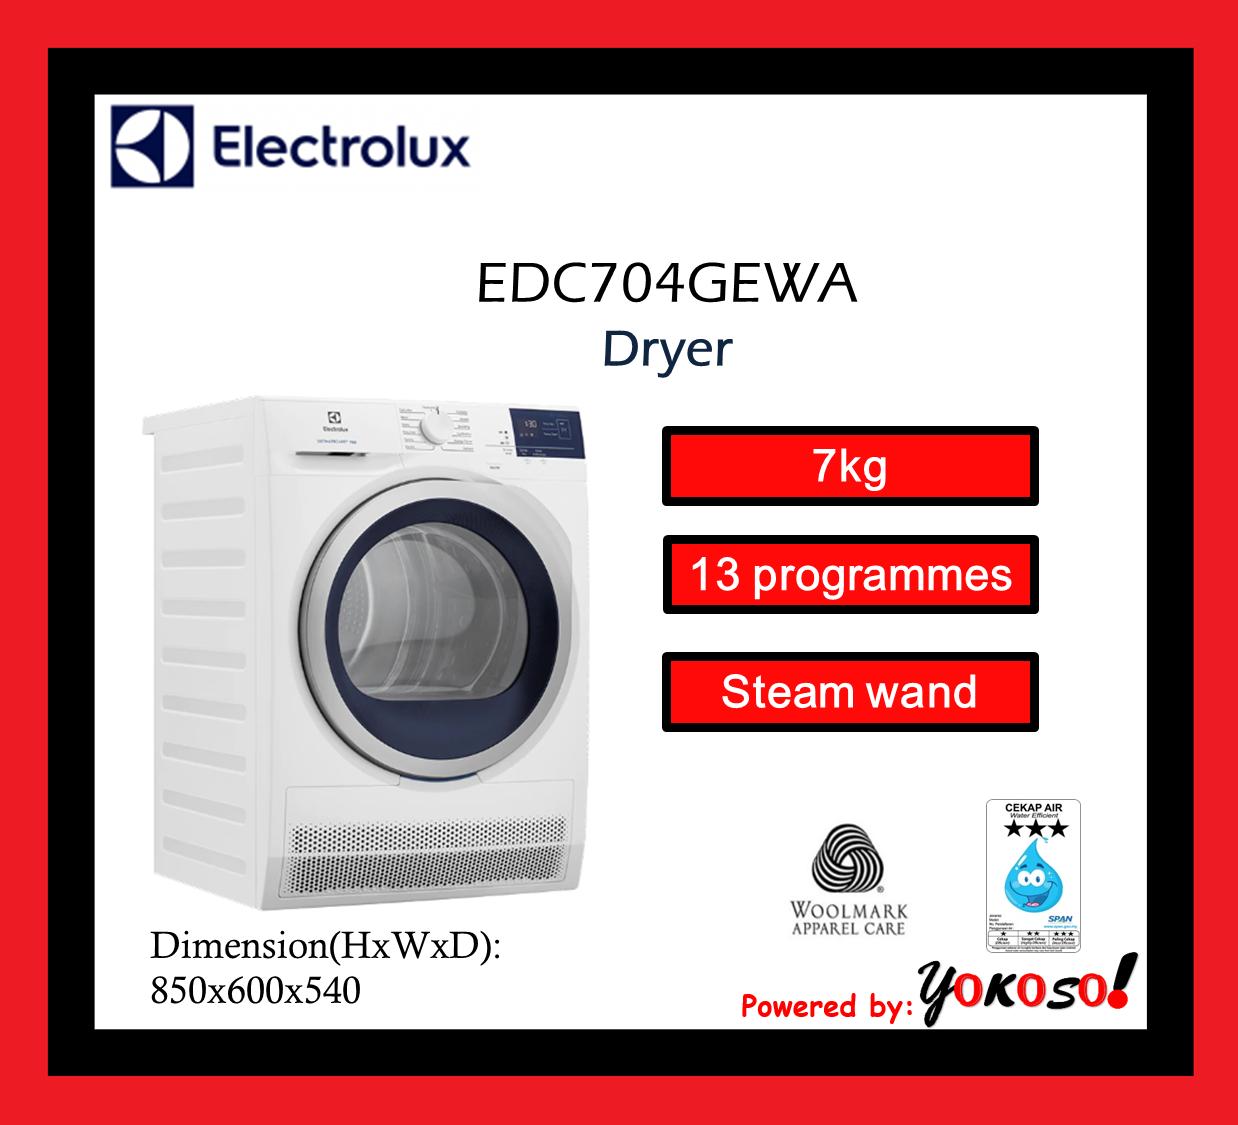 Electrolux EDC704GEWA 7kg UltimateCare™ 700 Condenser Dryer